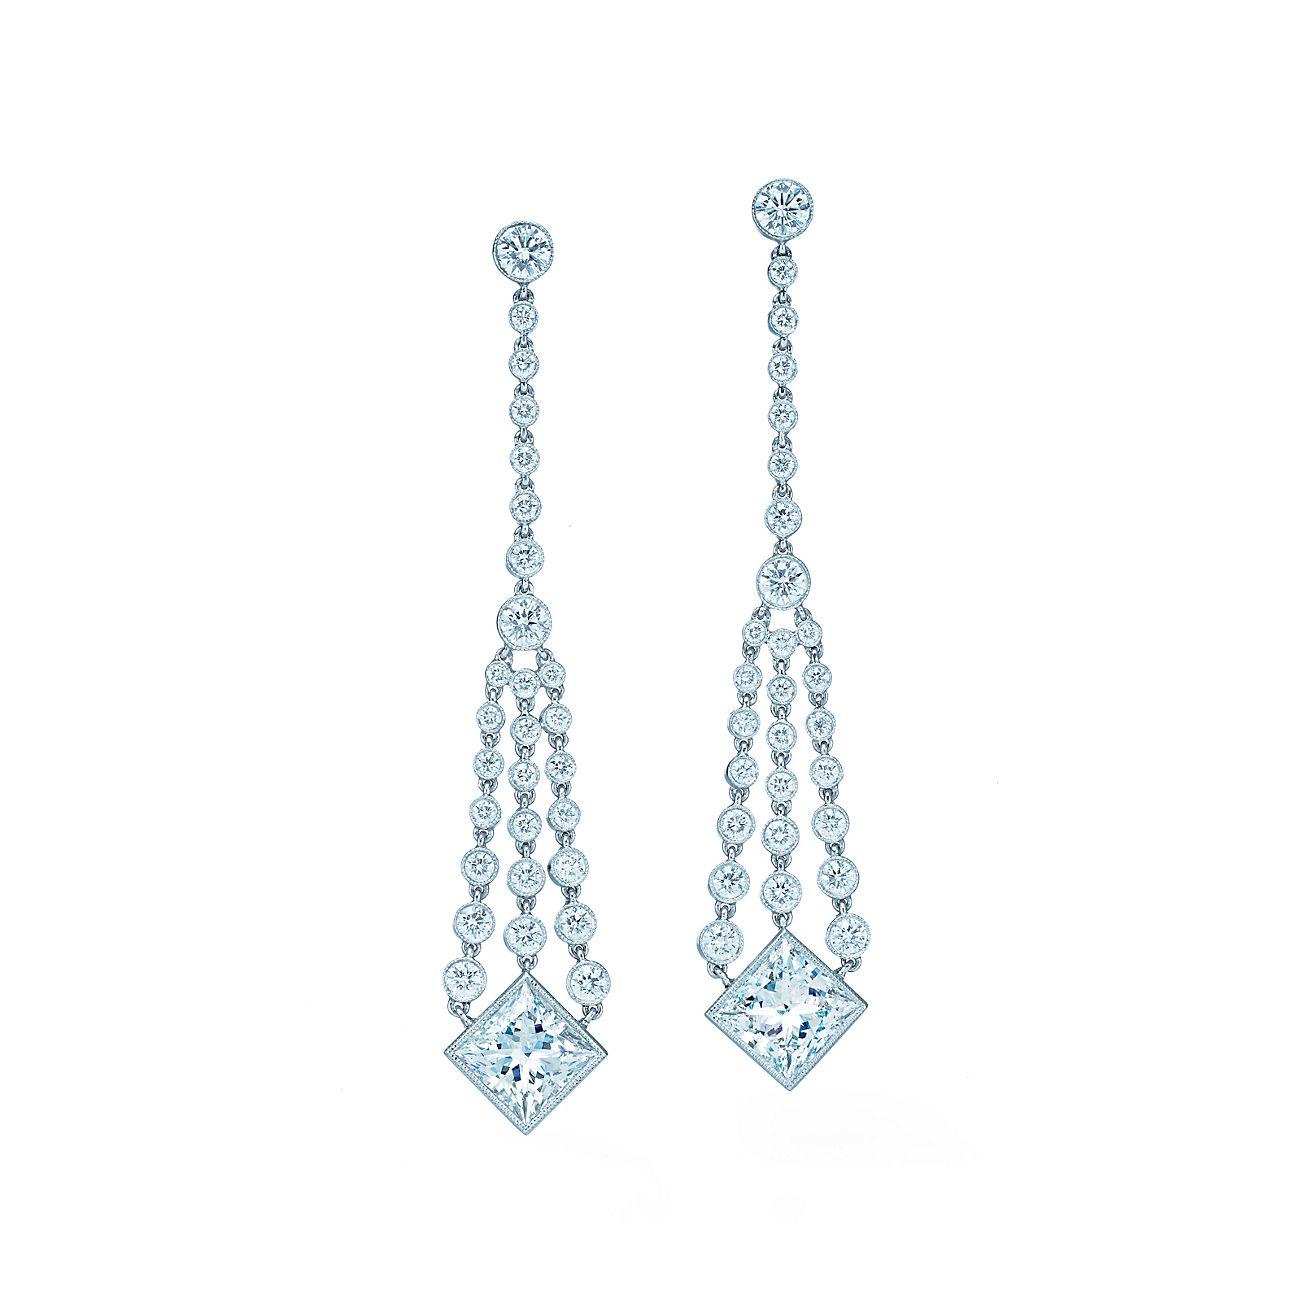 Diamond chandelier earrings of princesscut and round diamonds in – Aqua Chandelier Earrings